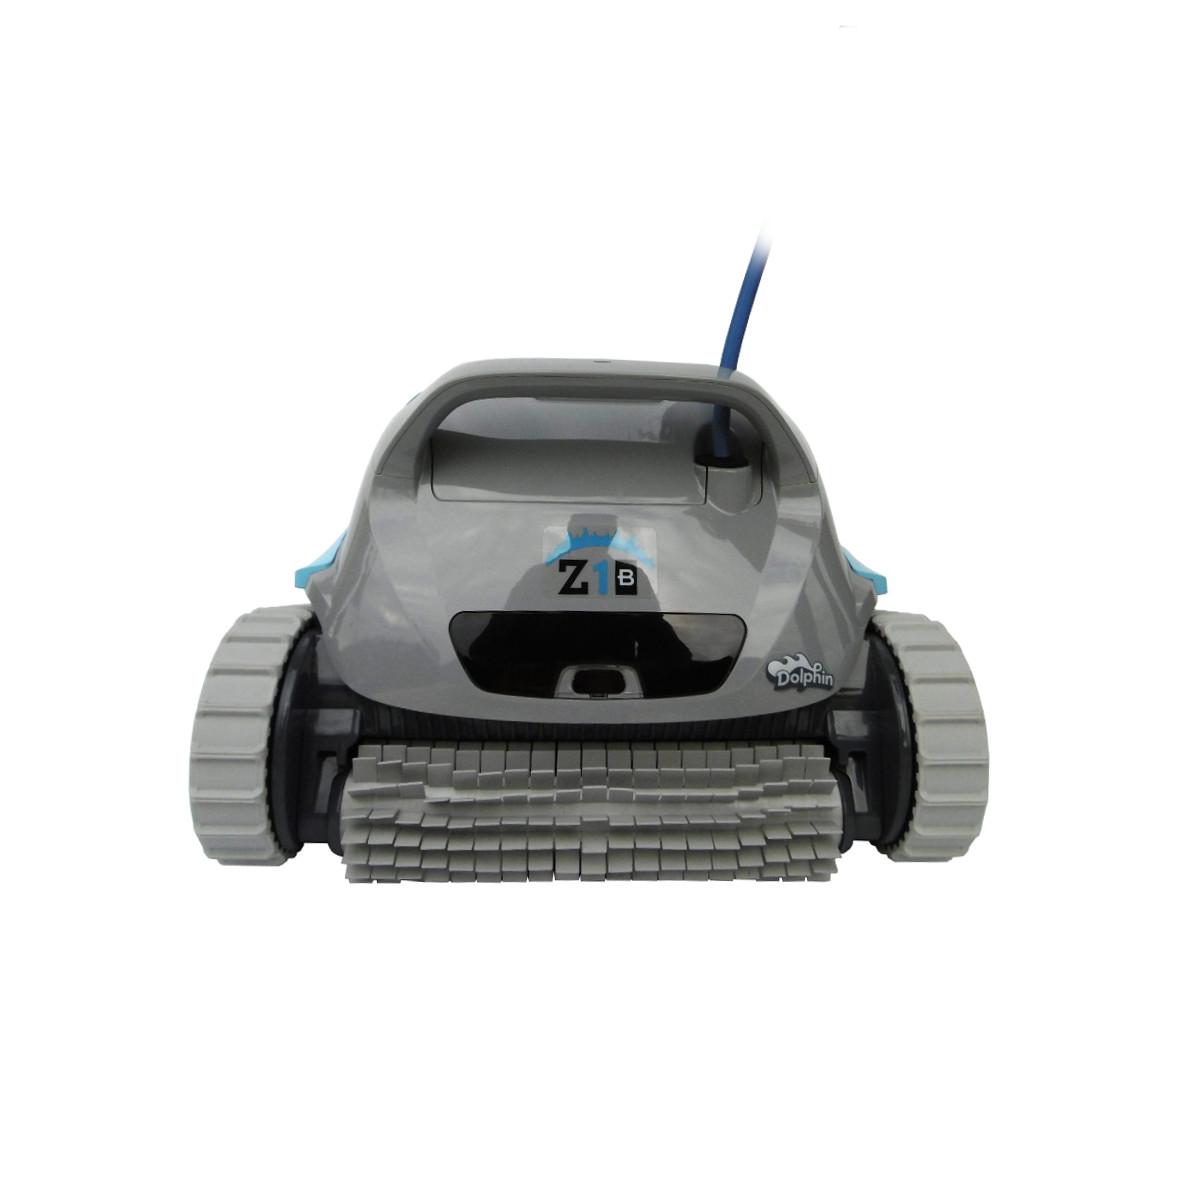 Robot Dolphin Z1B | MAYTRONICS